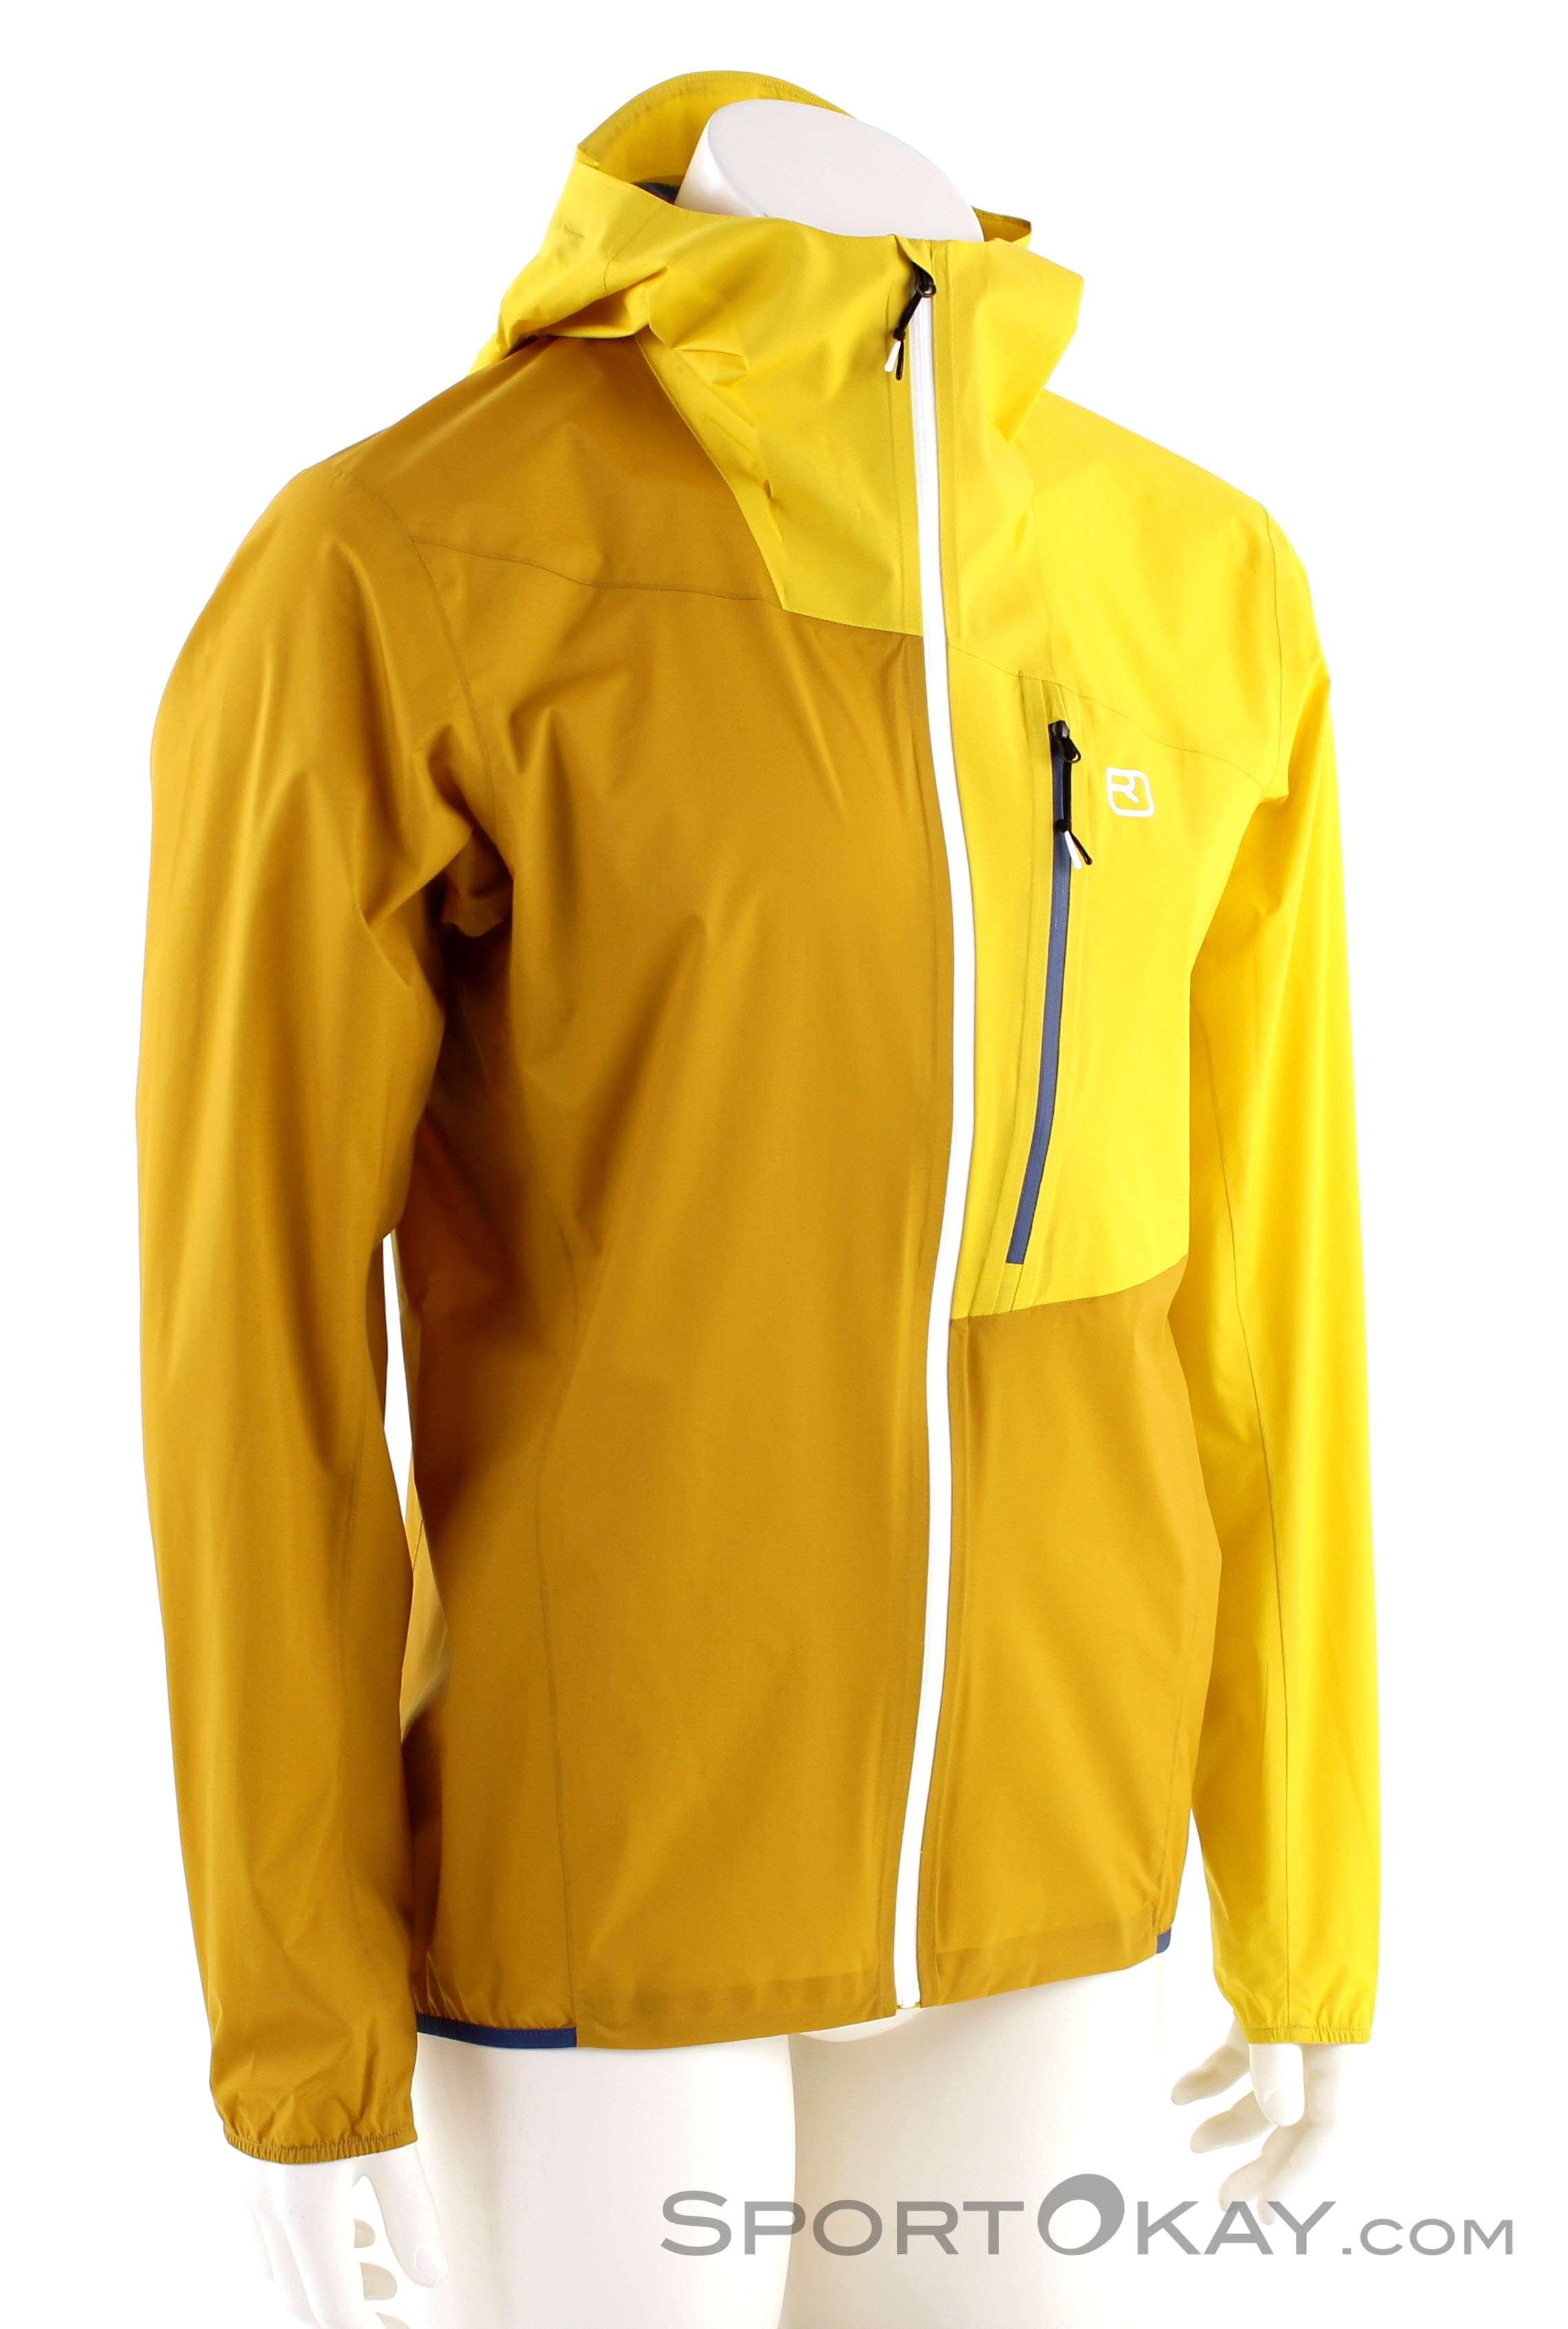 Ortovox Civetta Jacket 2.5l Mens Outdoor Jacket Jackets